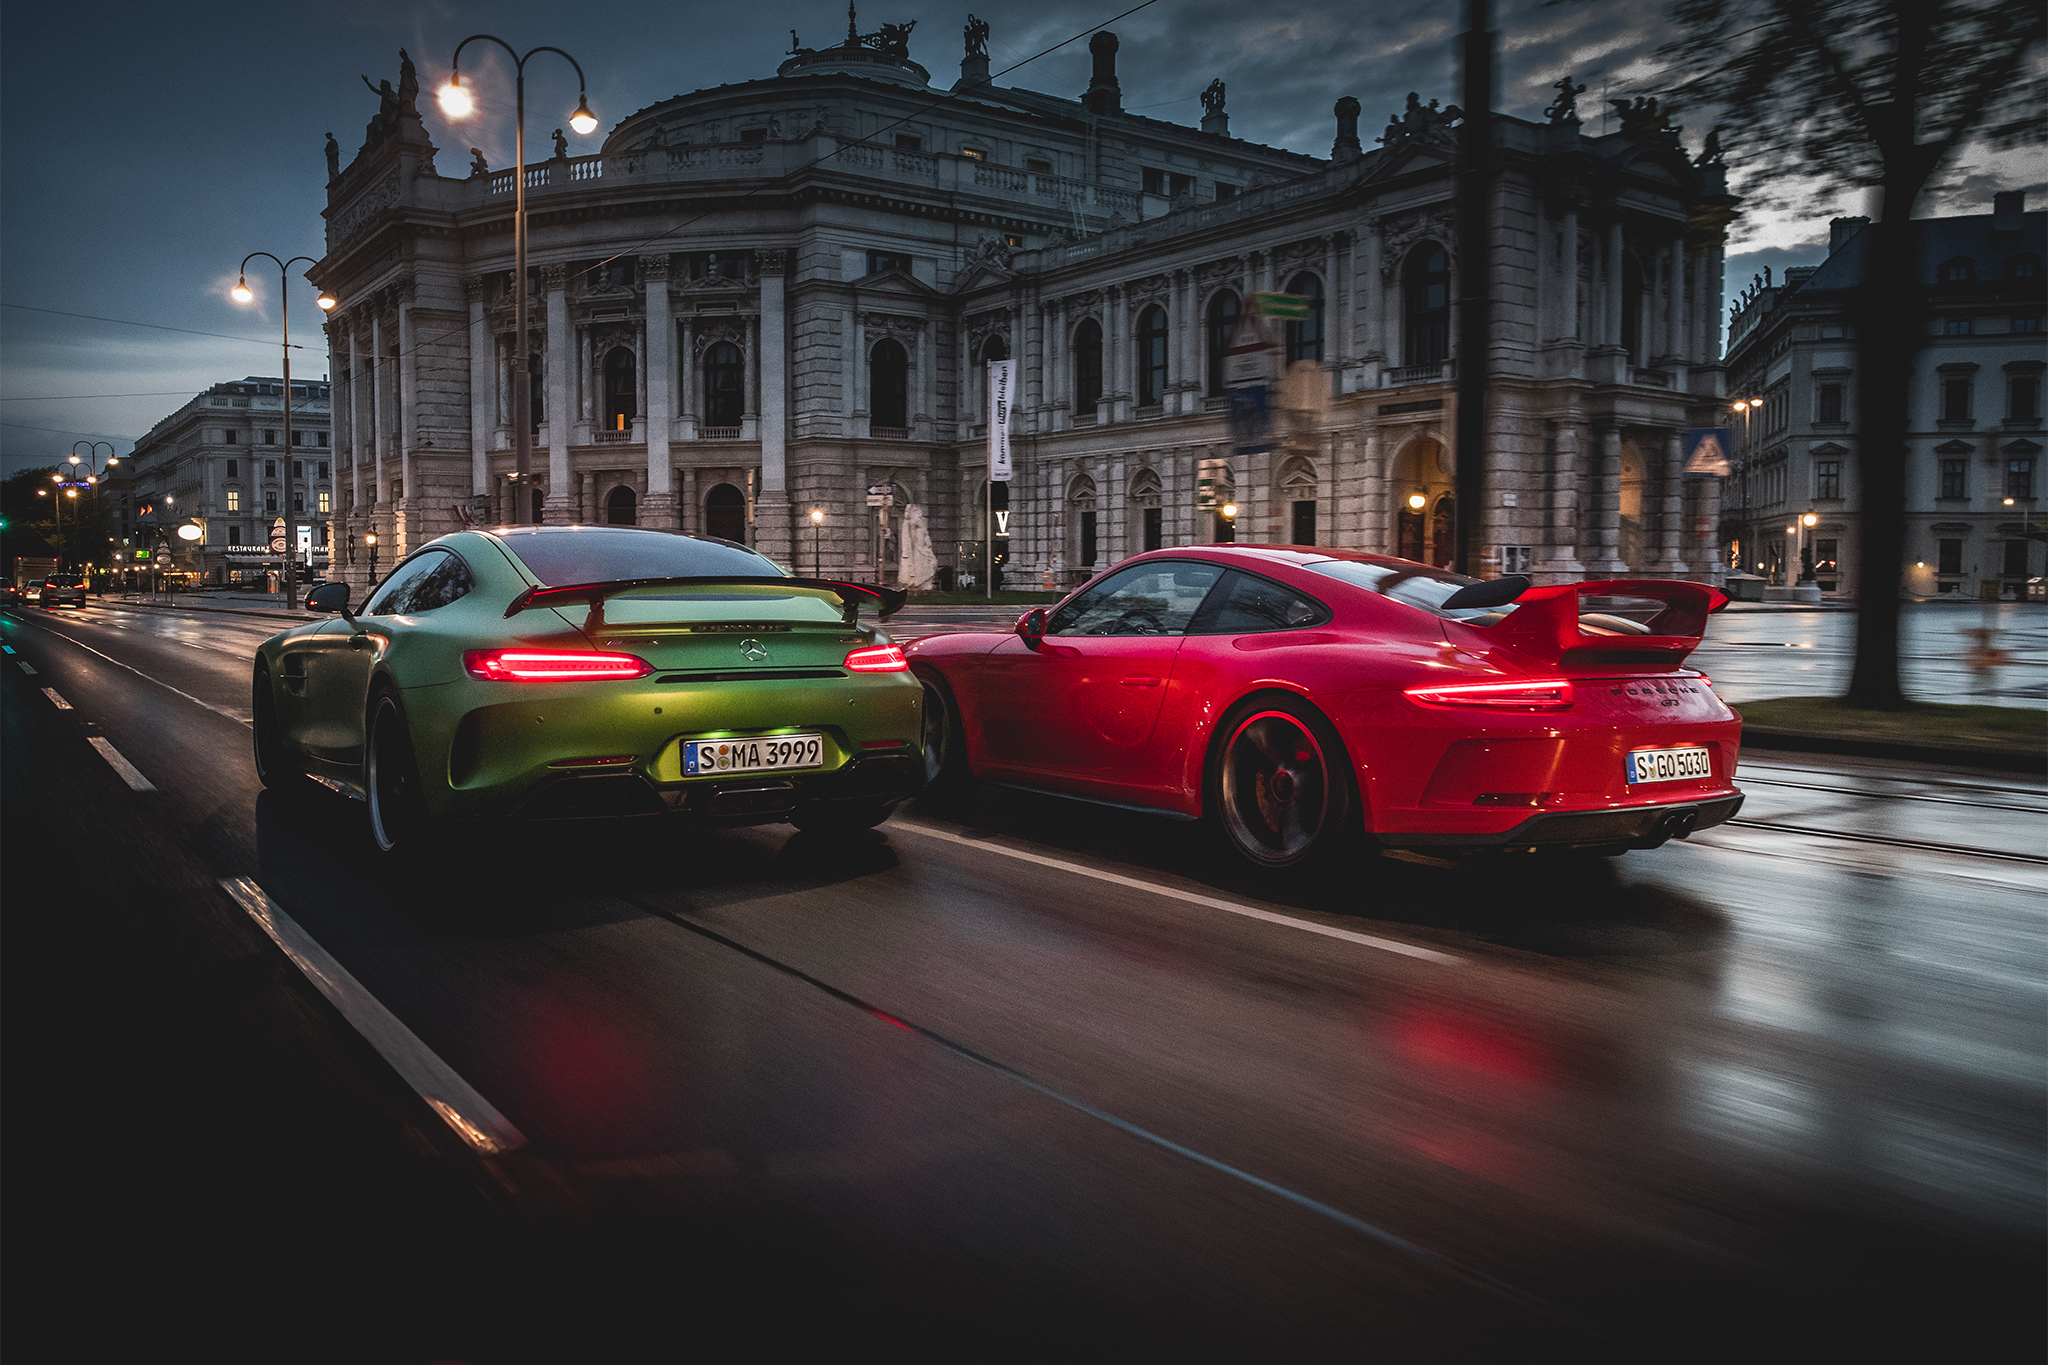 Porsche Vs Mercedes Amg Gt R Love At First